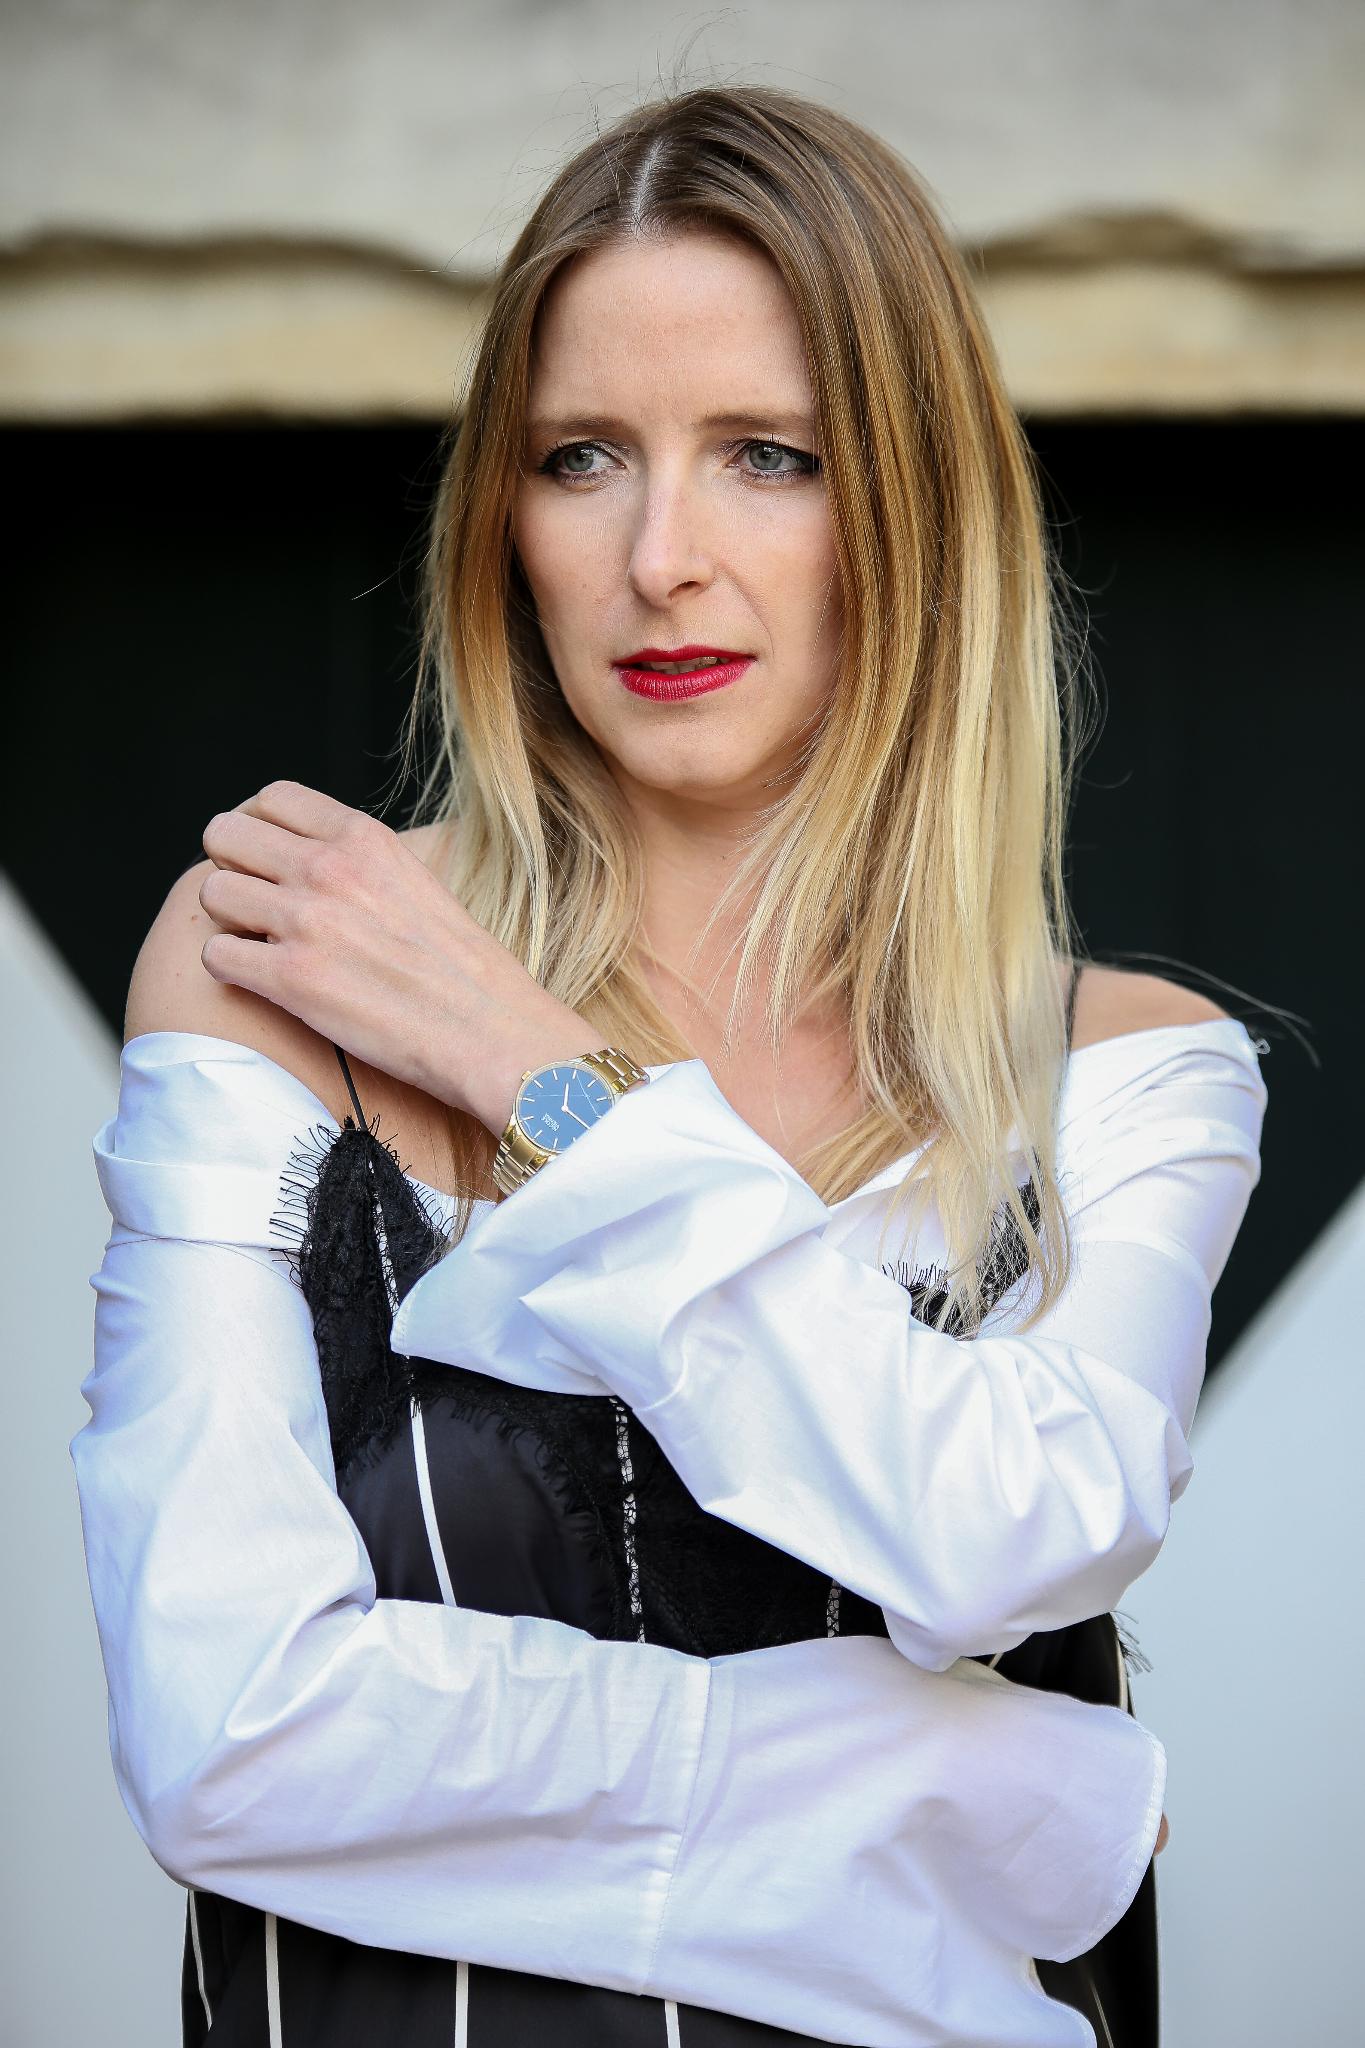 Fashion_Outfit_Off_Shoulder_Striped_Slipdress_MOD - by Monique-3